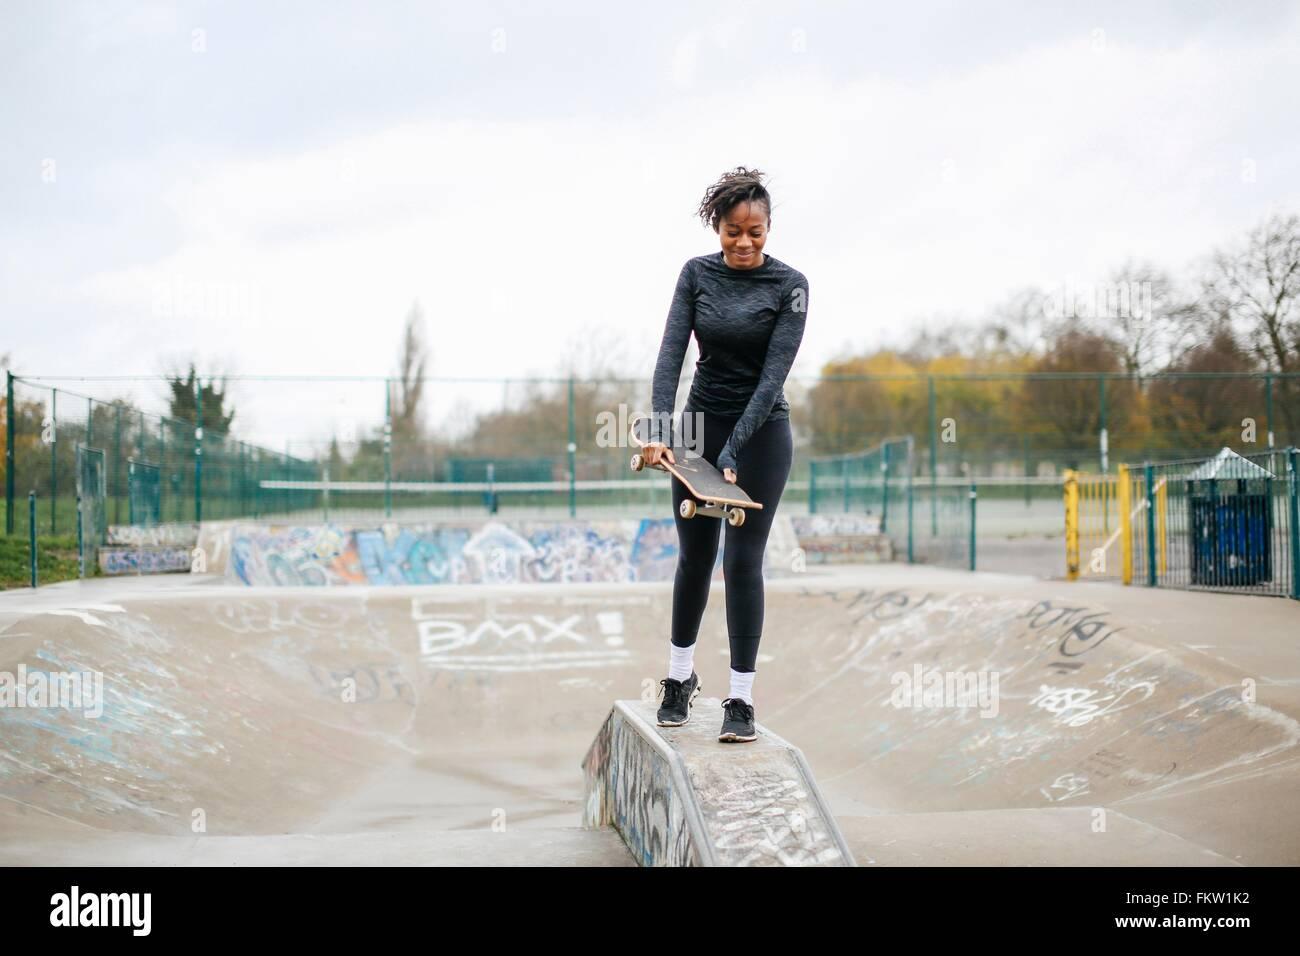 Young female skateboarder preparing to practice in skateboard park - Stock Image